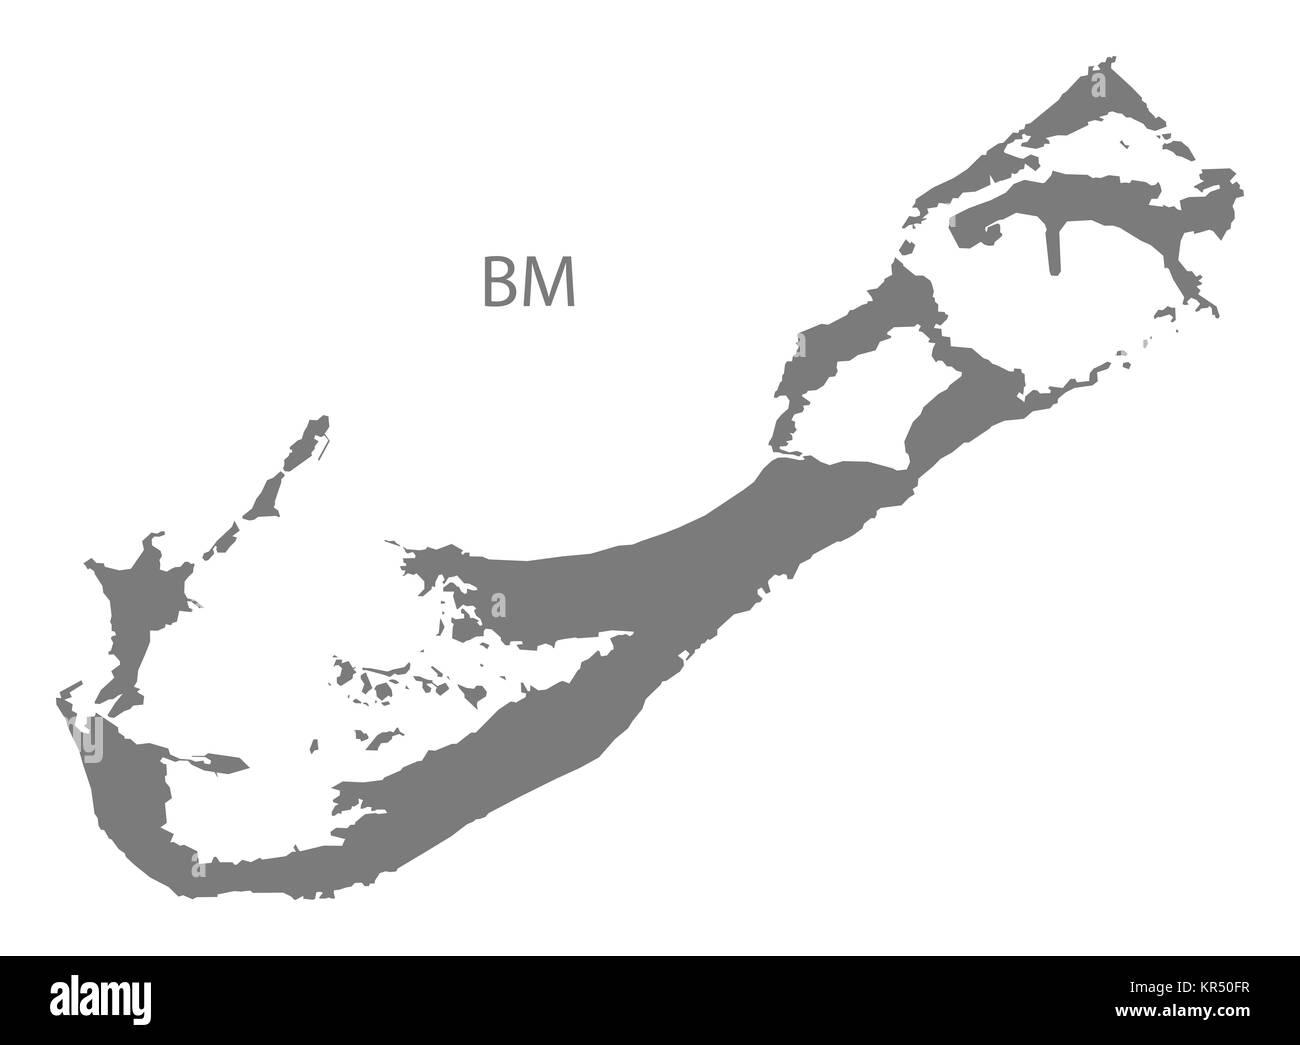 Map Bermuda Stockfotos & Map Bermuda Bilder - Seite 2 - Alamy